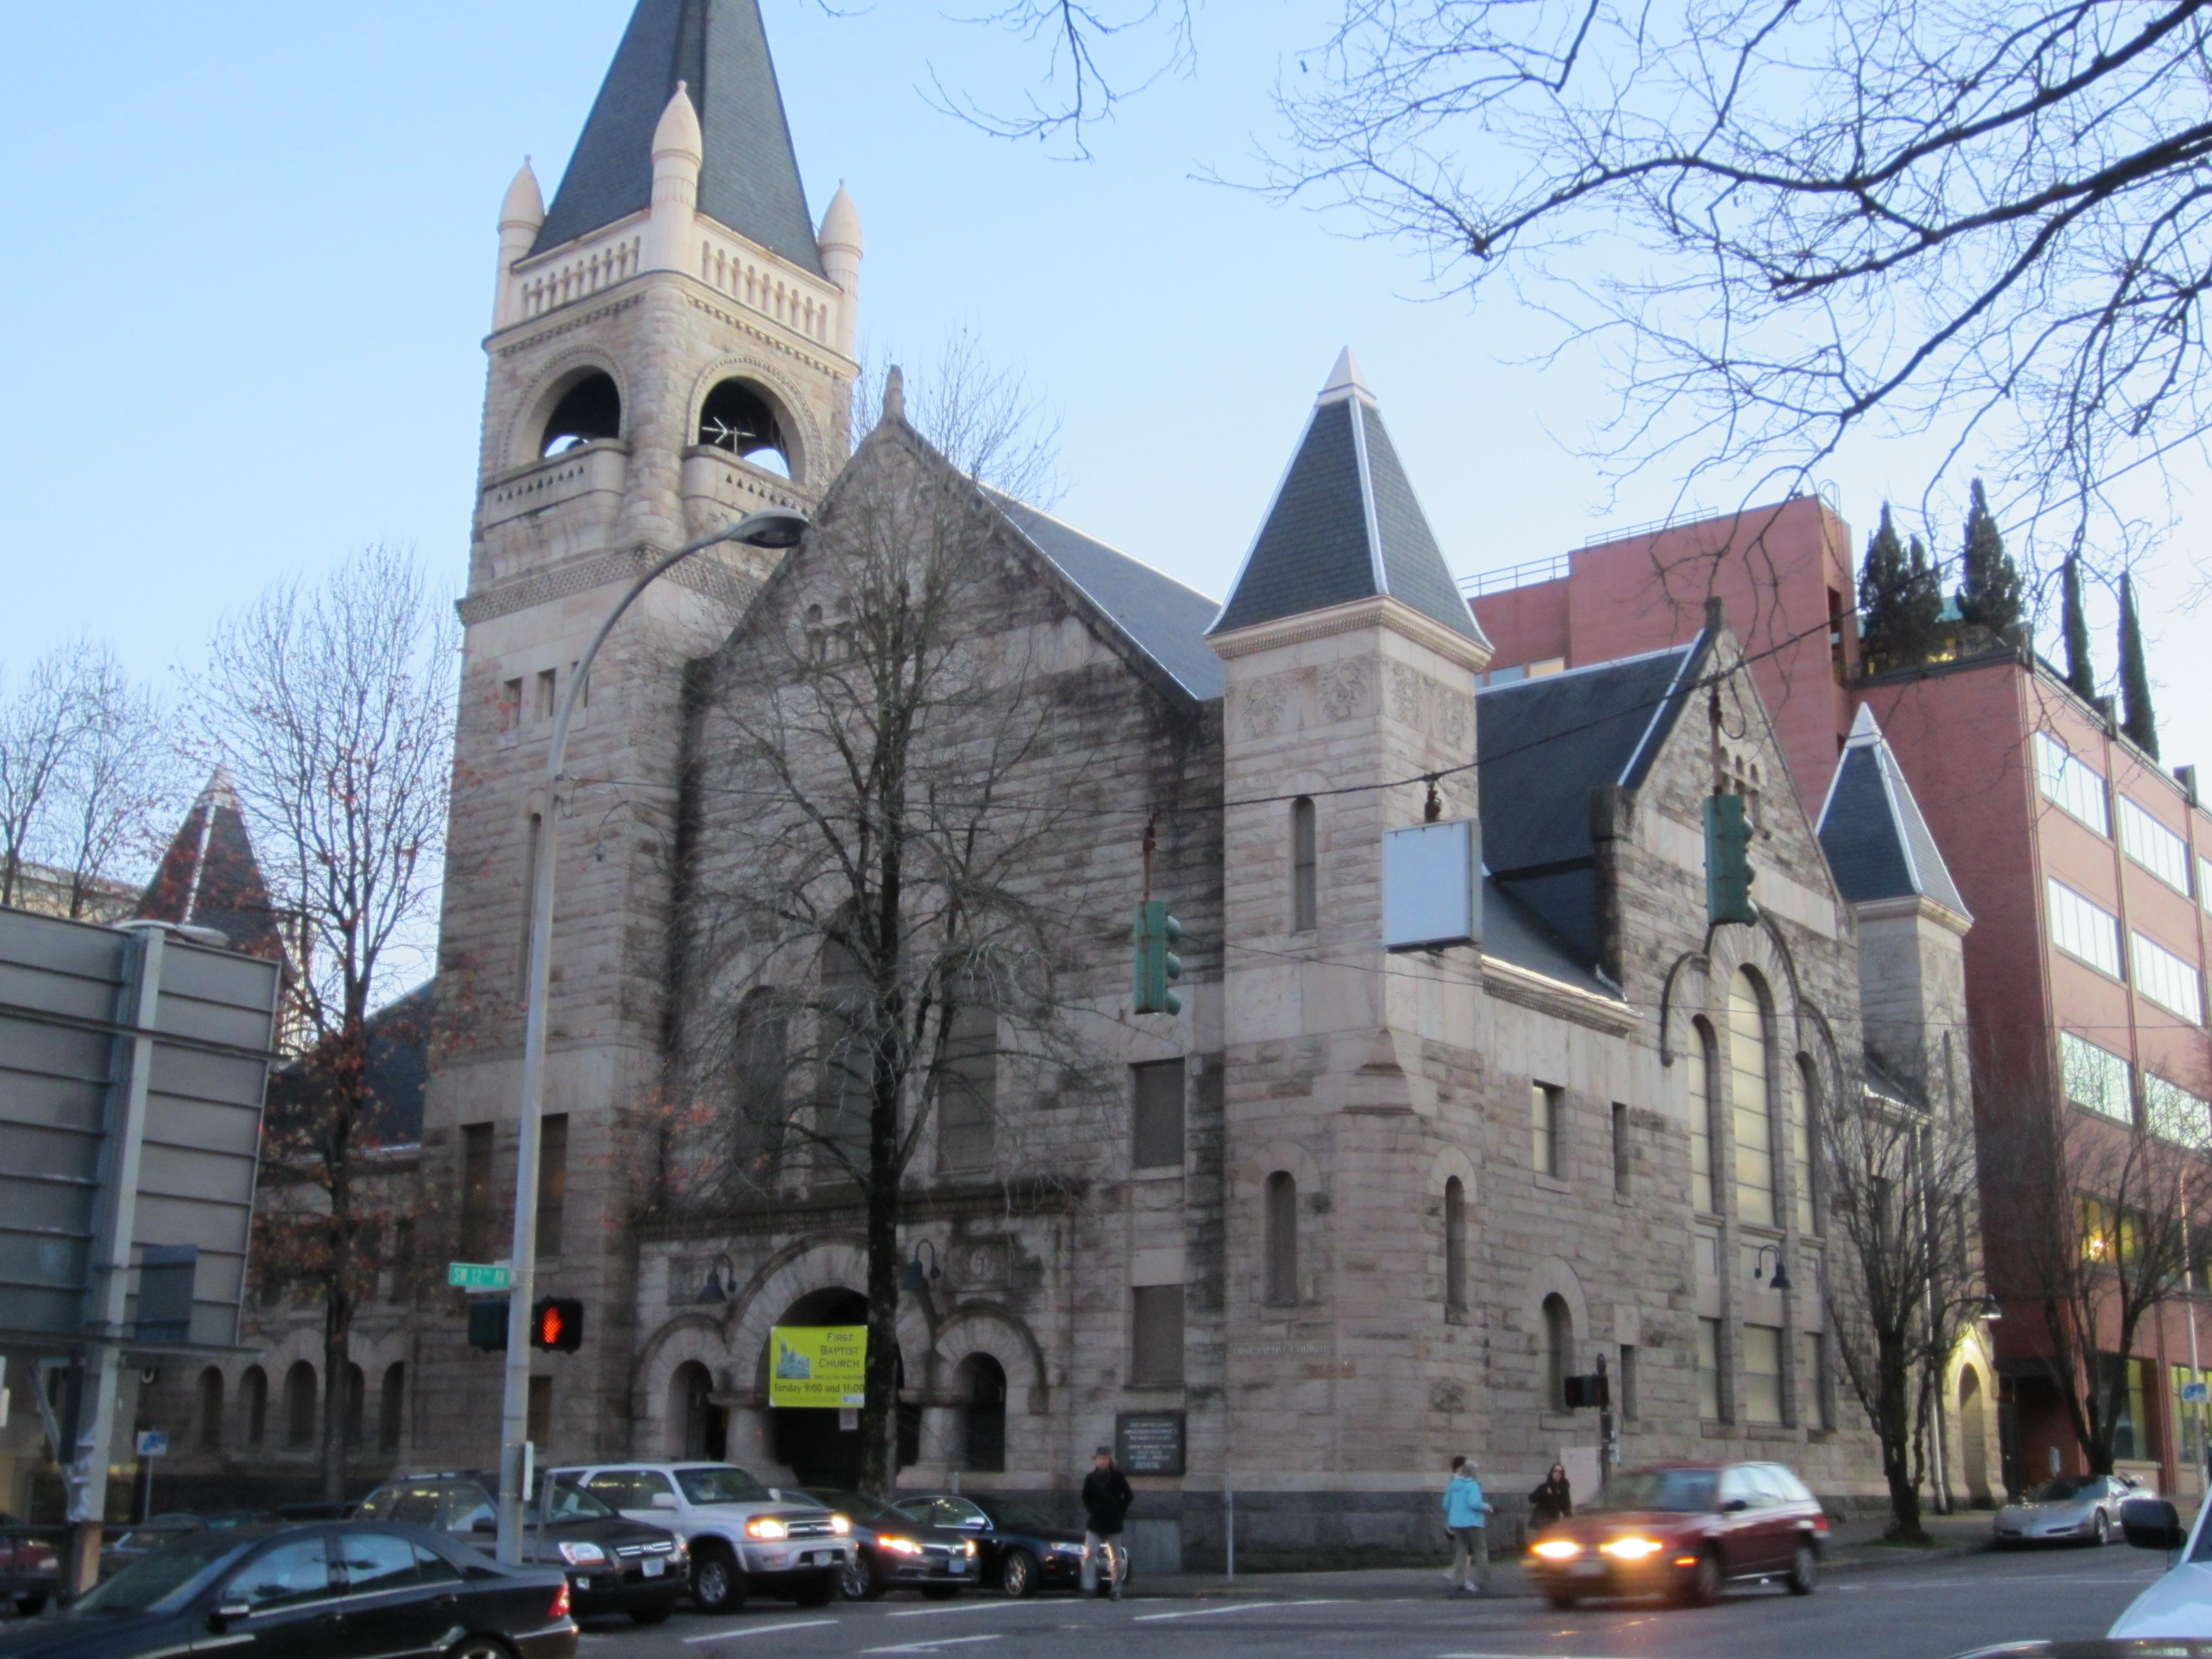 File:First Baptist Church, Portland, OR 2012.JPG